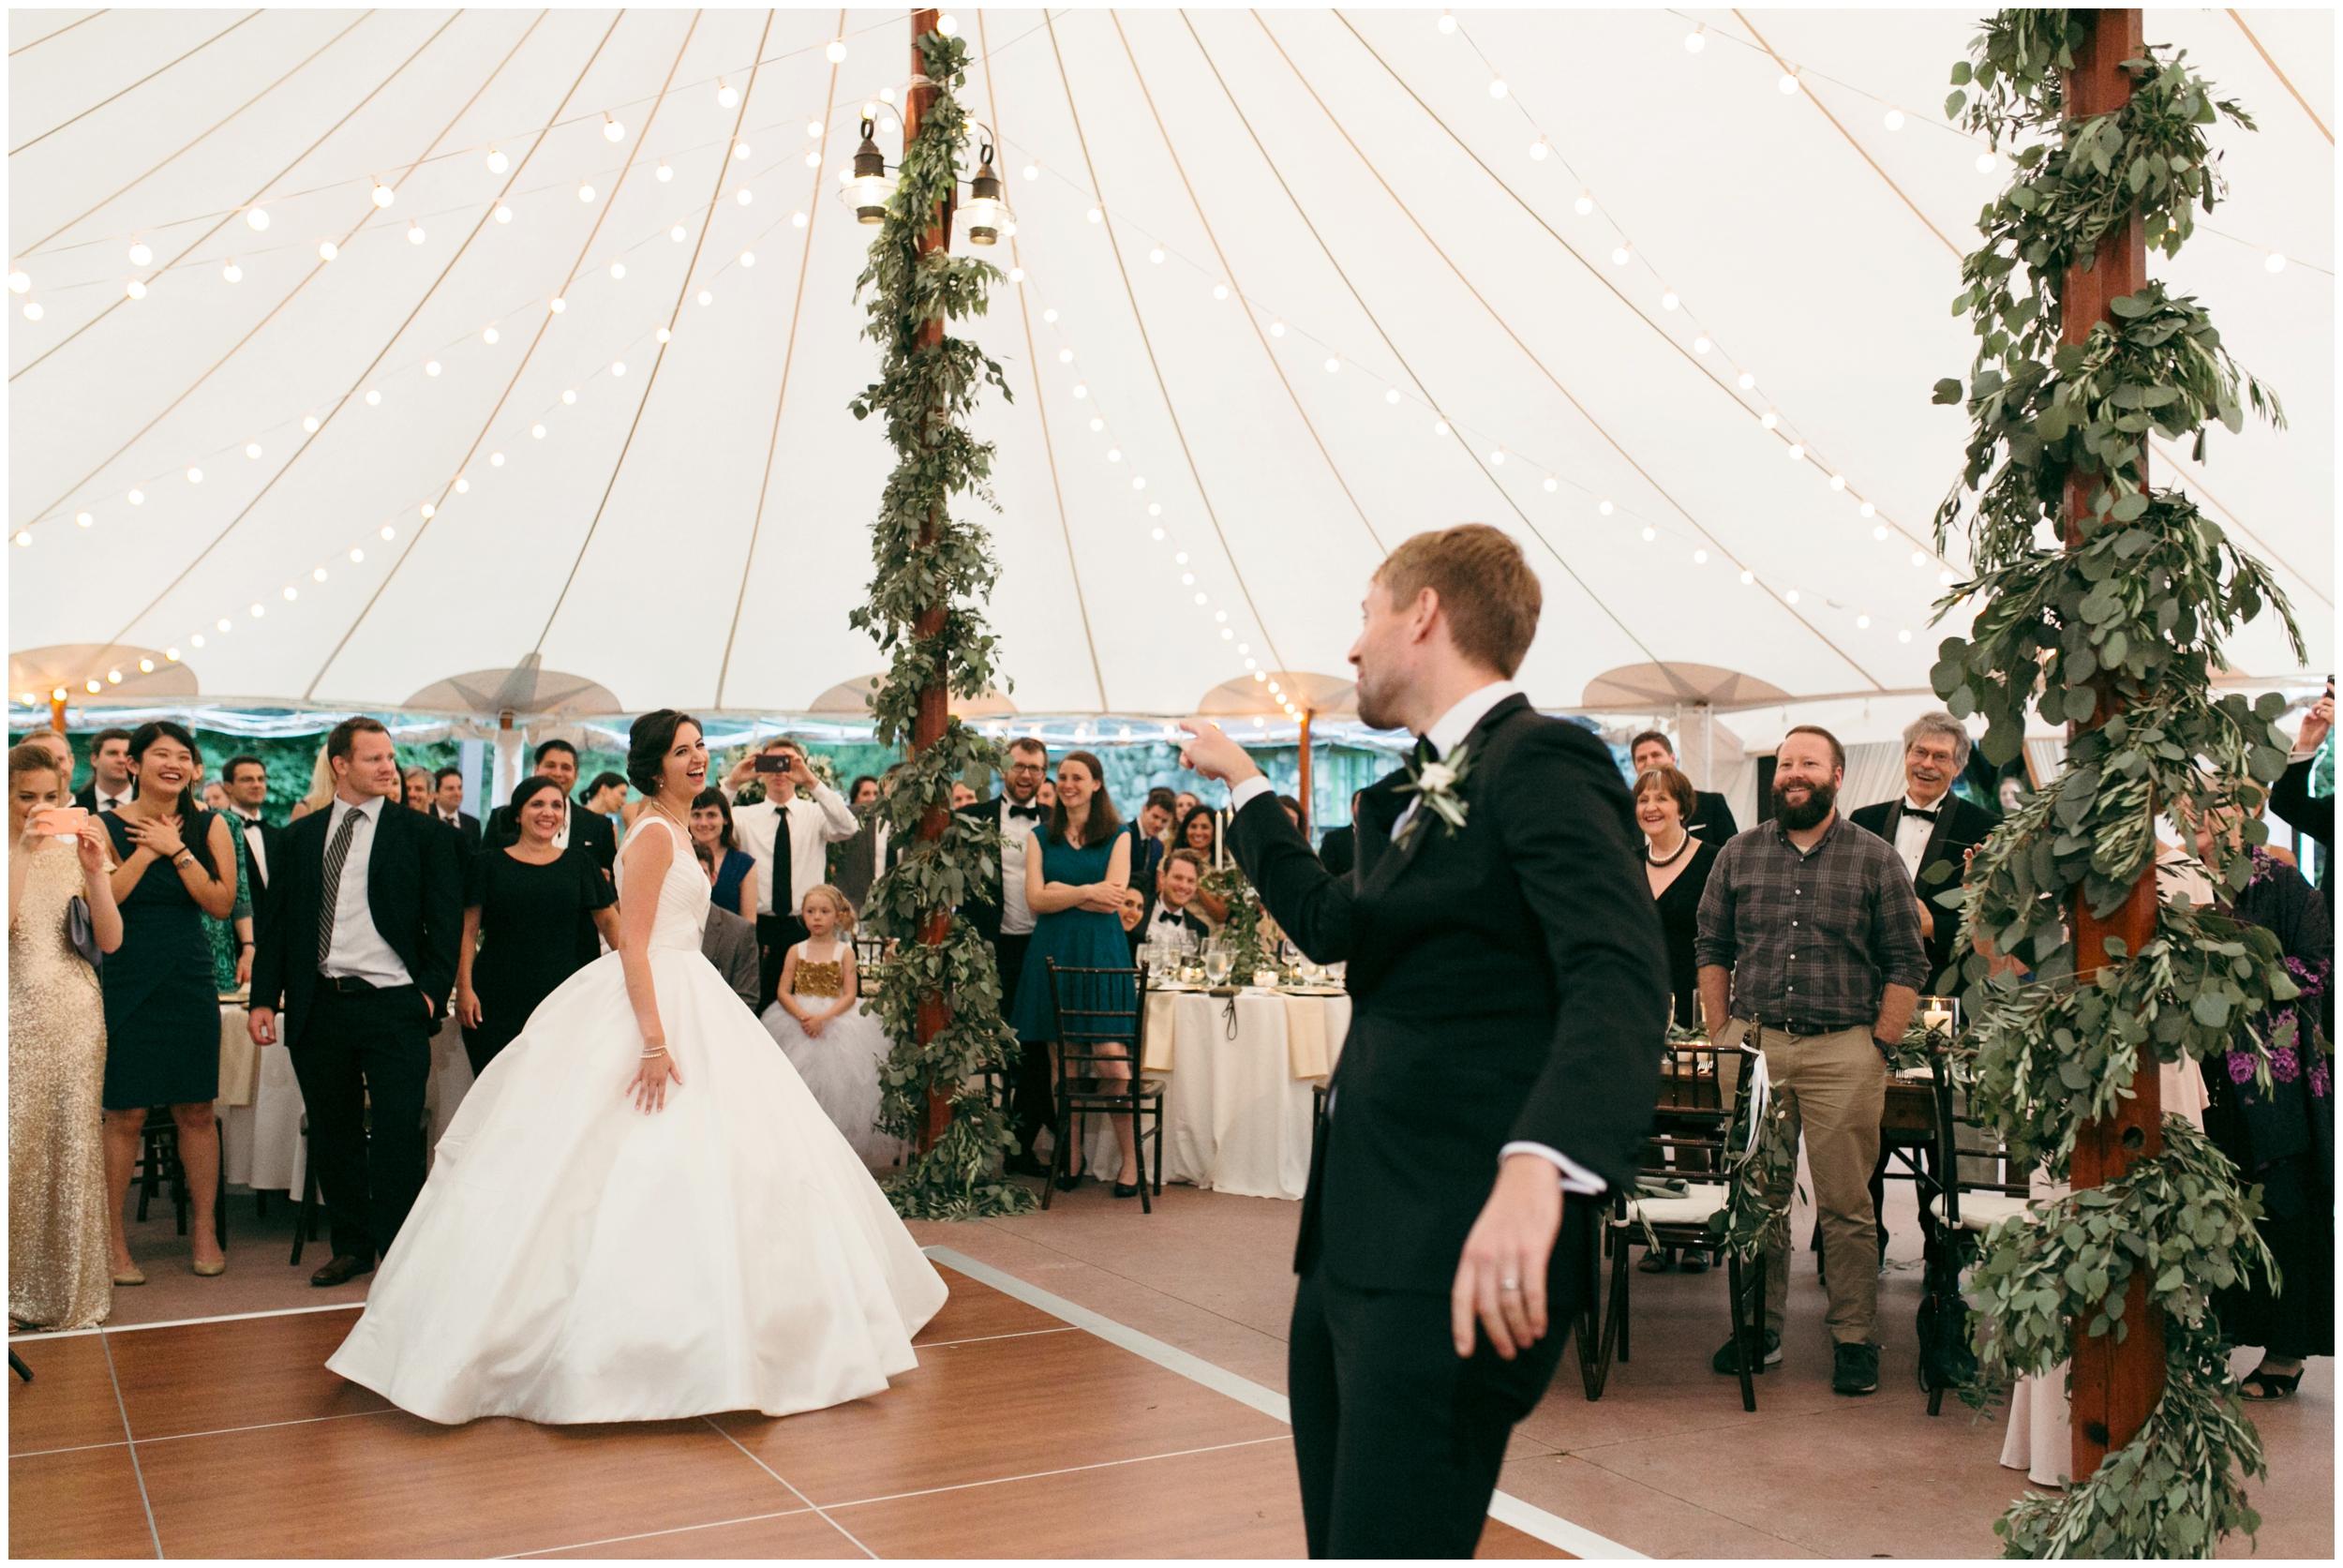 Willowdale-Estate-Wedding-Bailey-Q-Photo-Boston-Wedding-Photographer-078.JPG